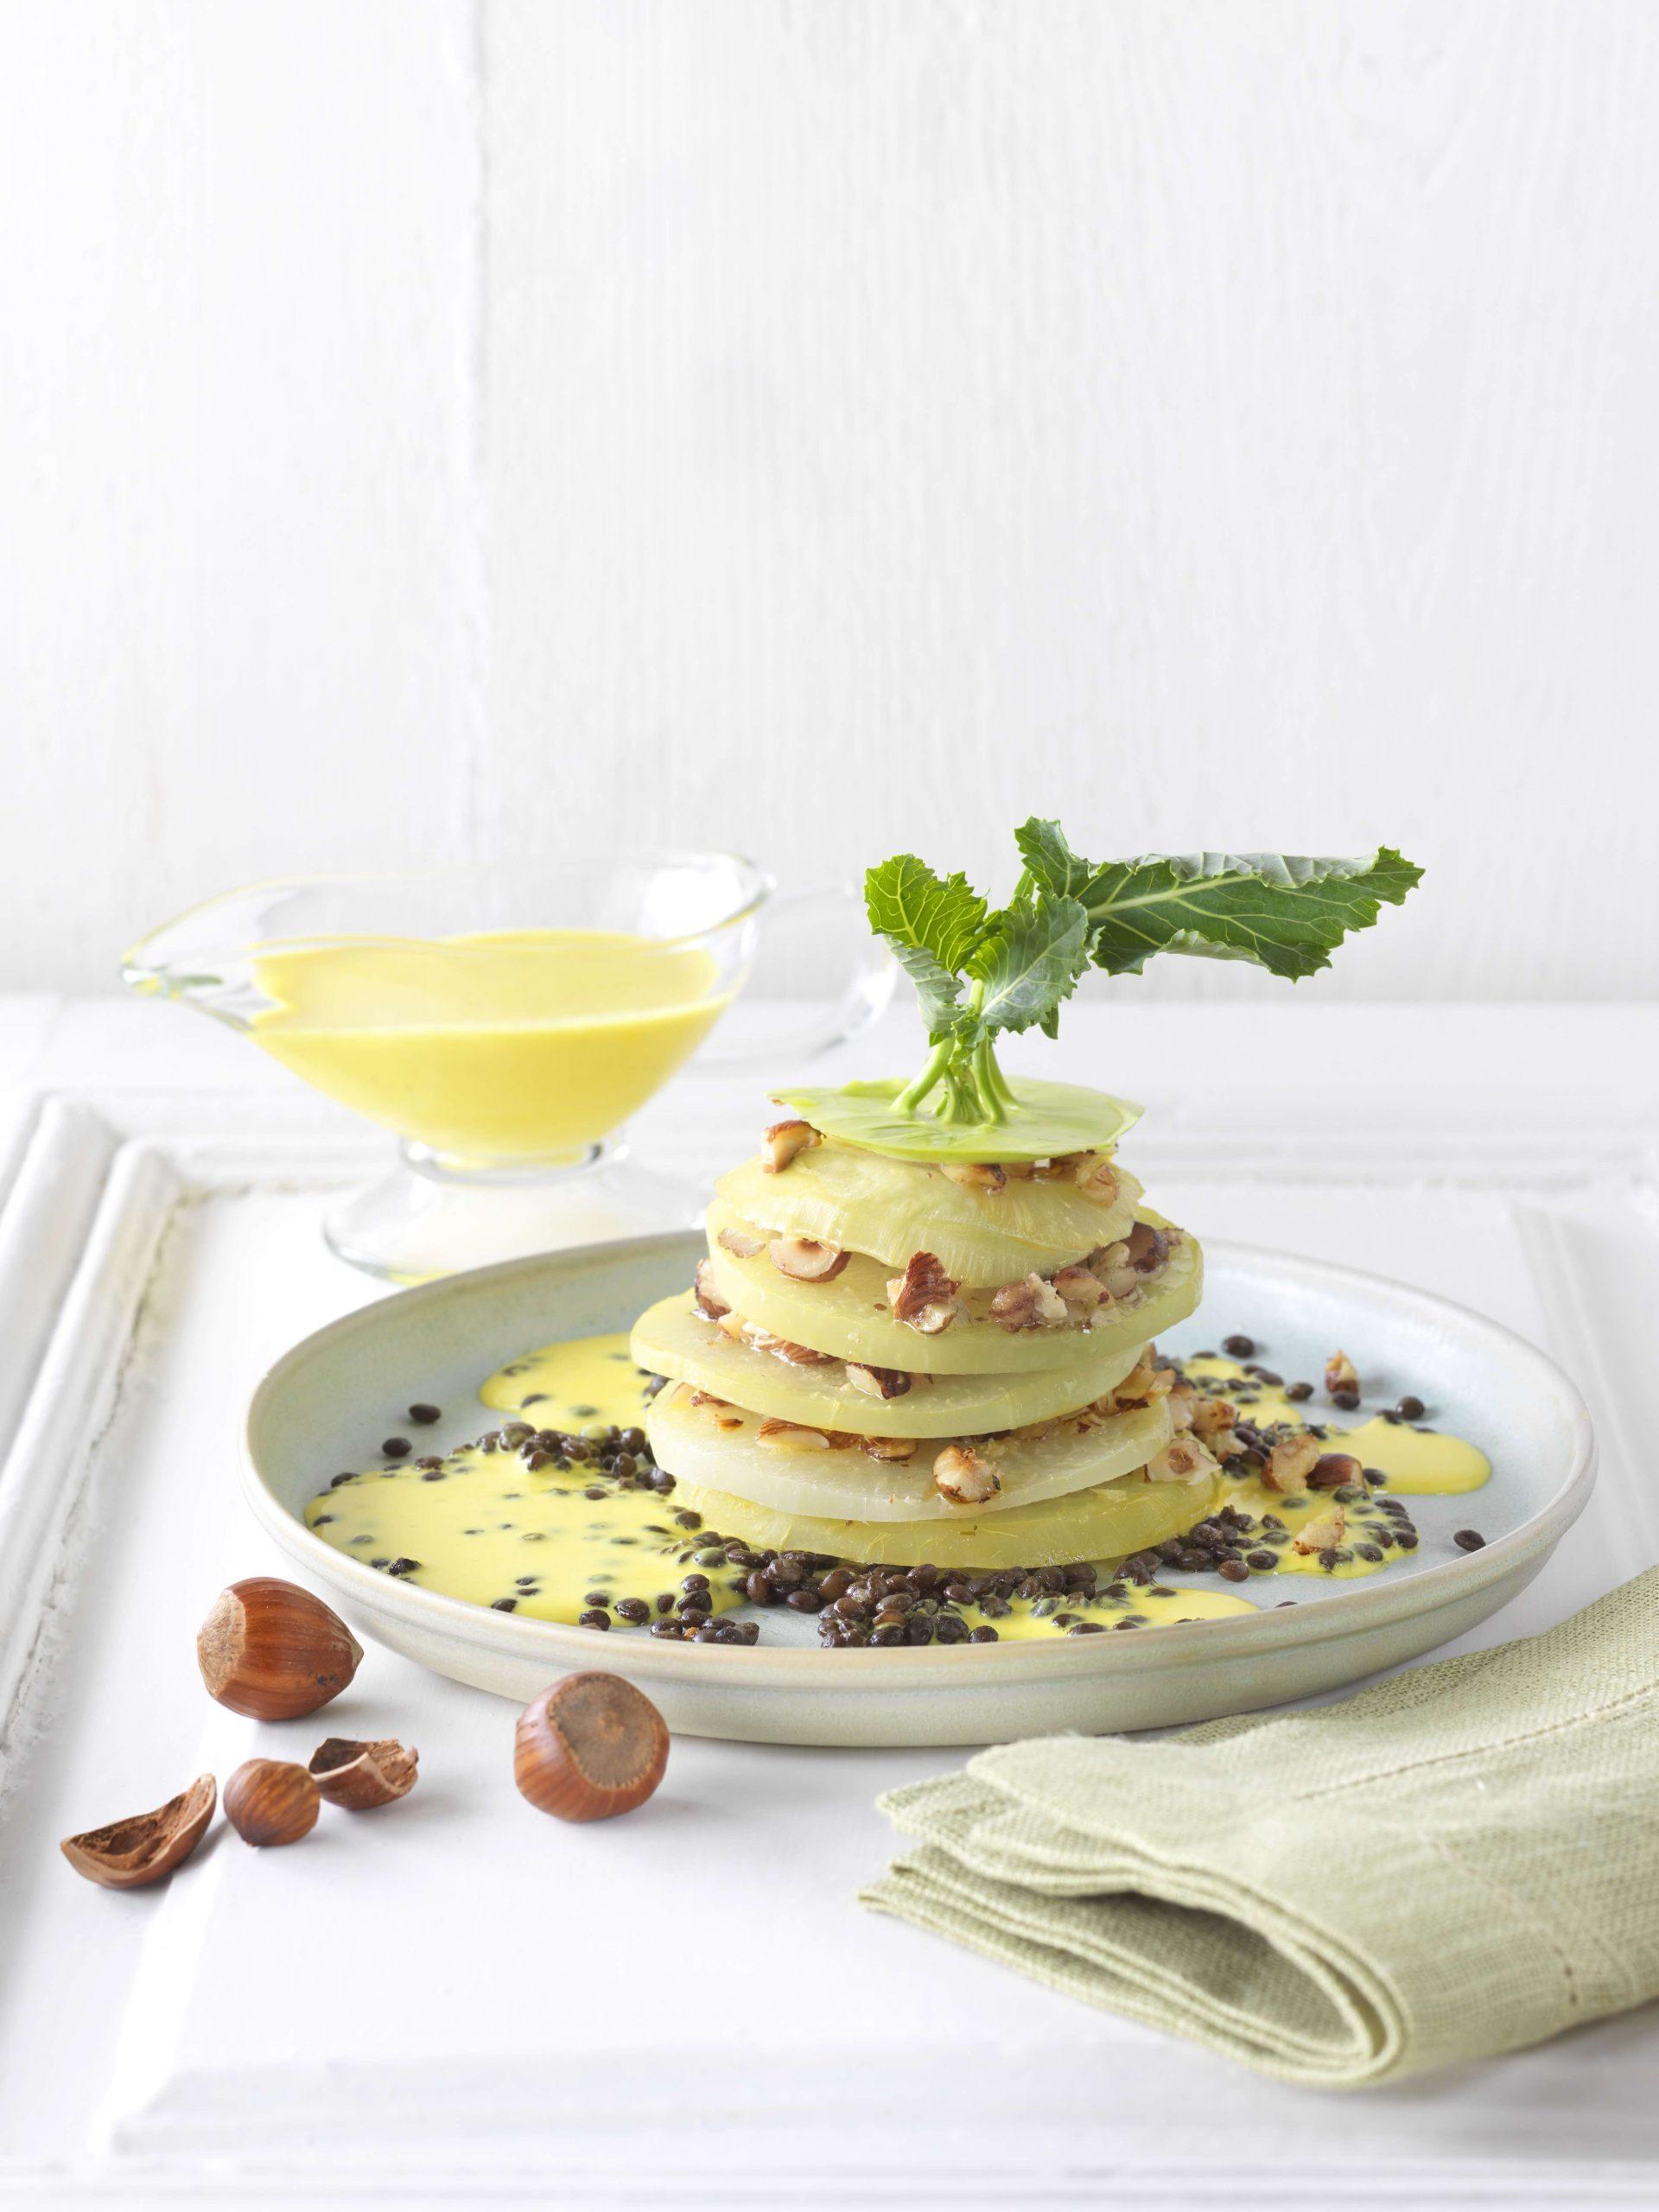 Sommerküche: Kohlrabi mit Zitronenrahm & Linsen